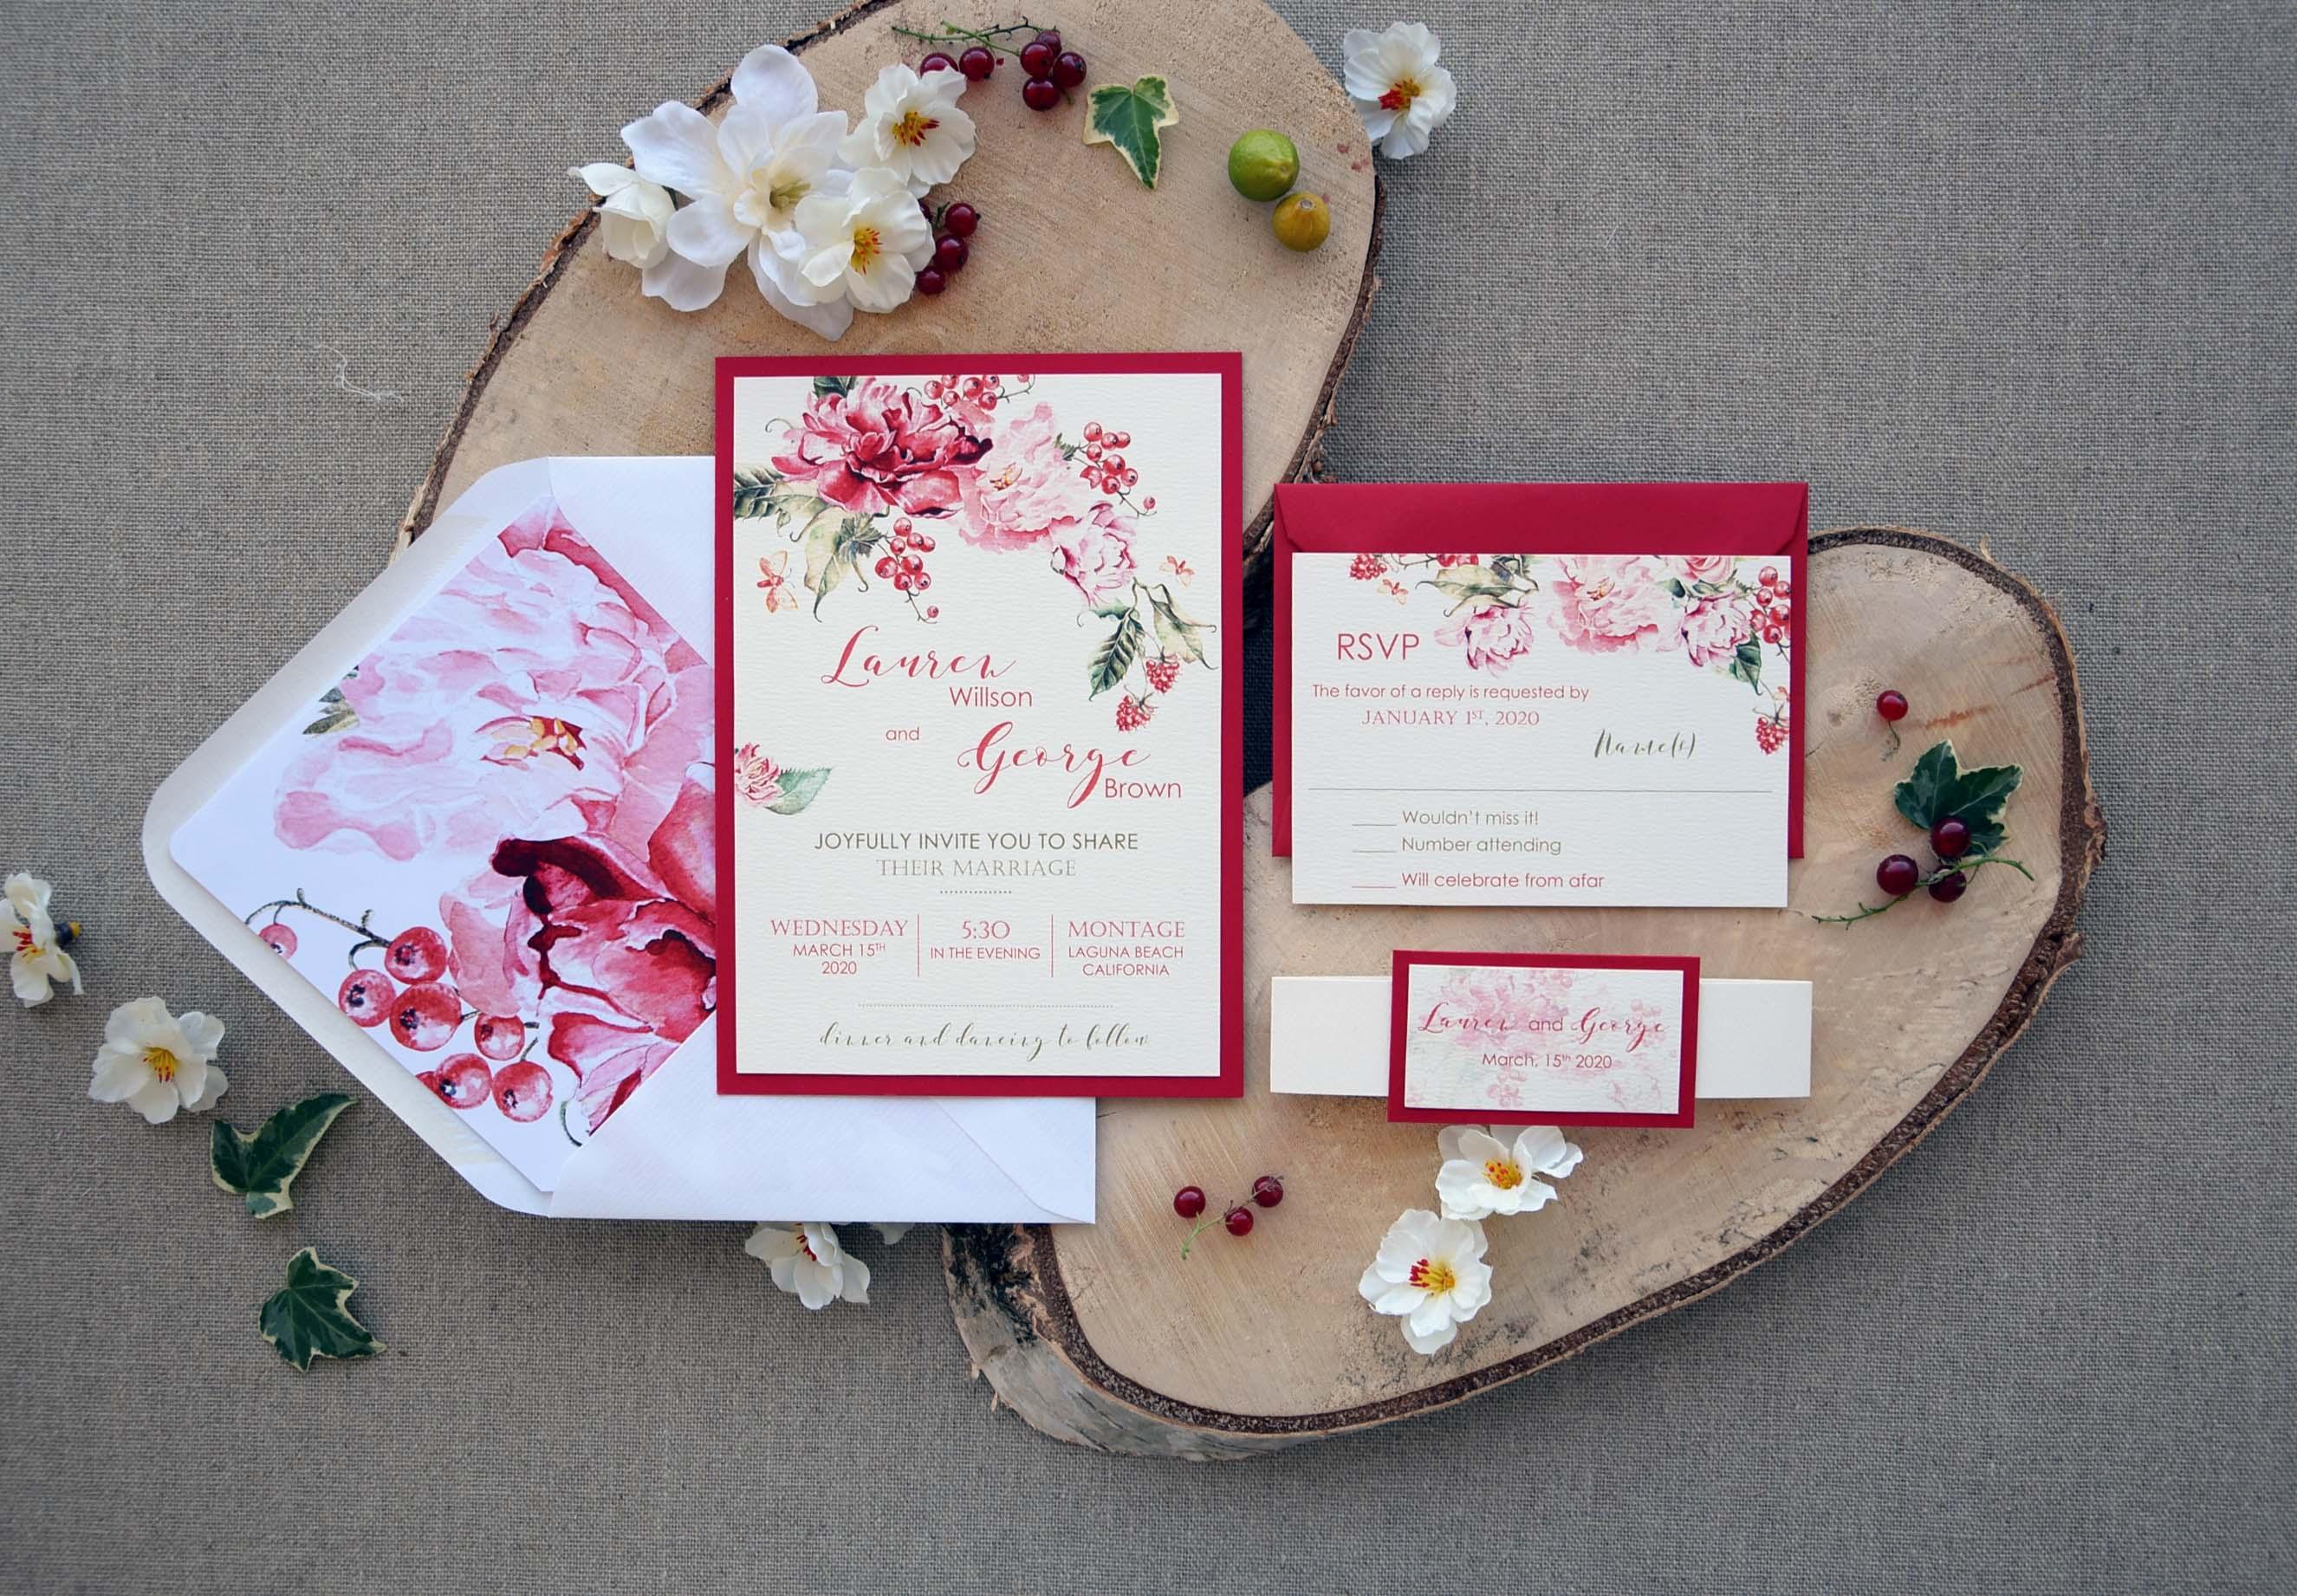 Customized Wedding Invitations: Colorful Customized Wedding Invitations Card, Red